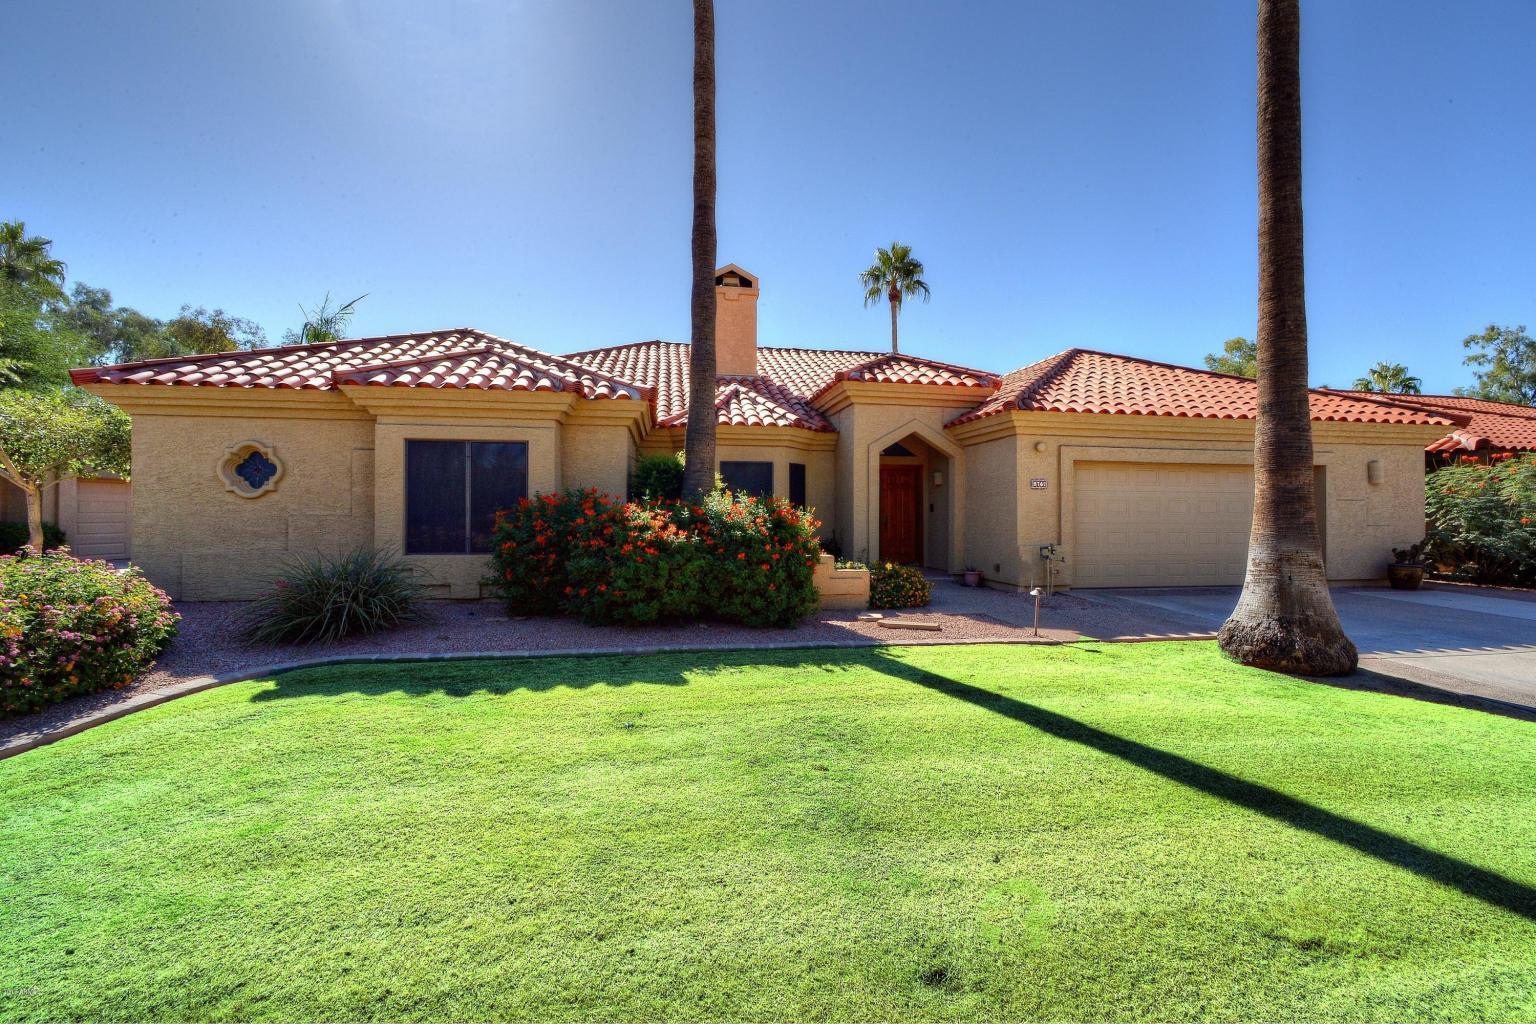 8761 E San Victor Dr, Scottsdale | $625,000